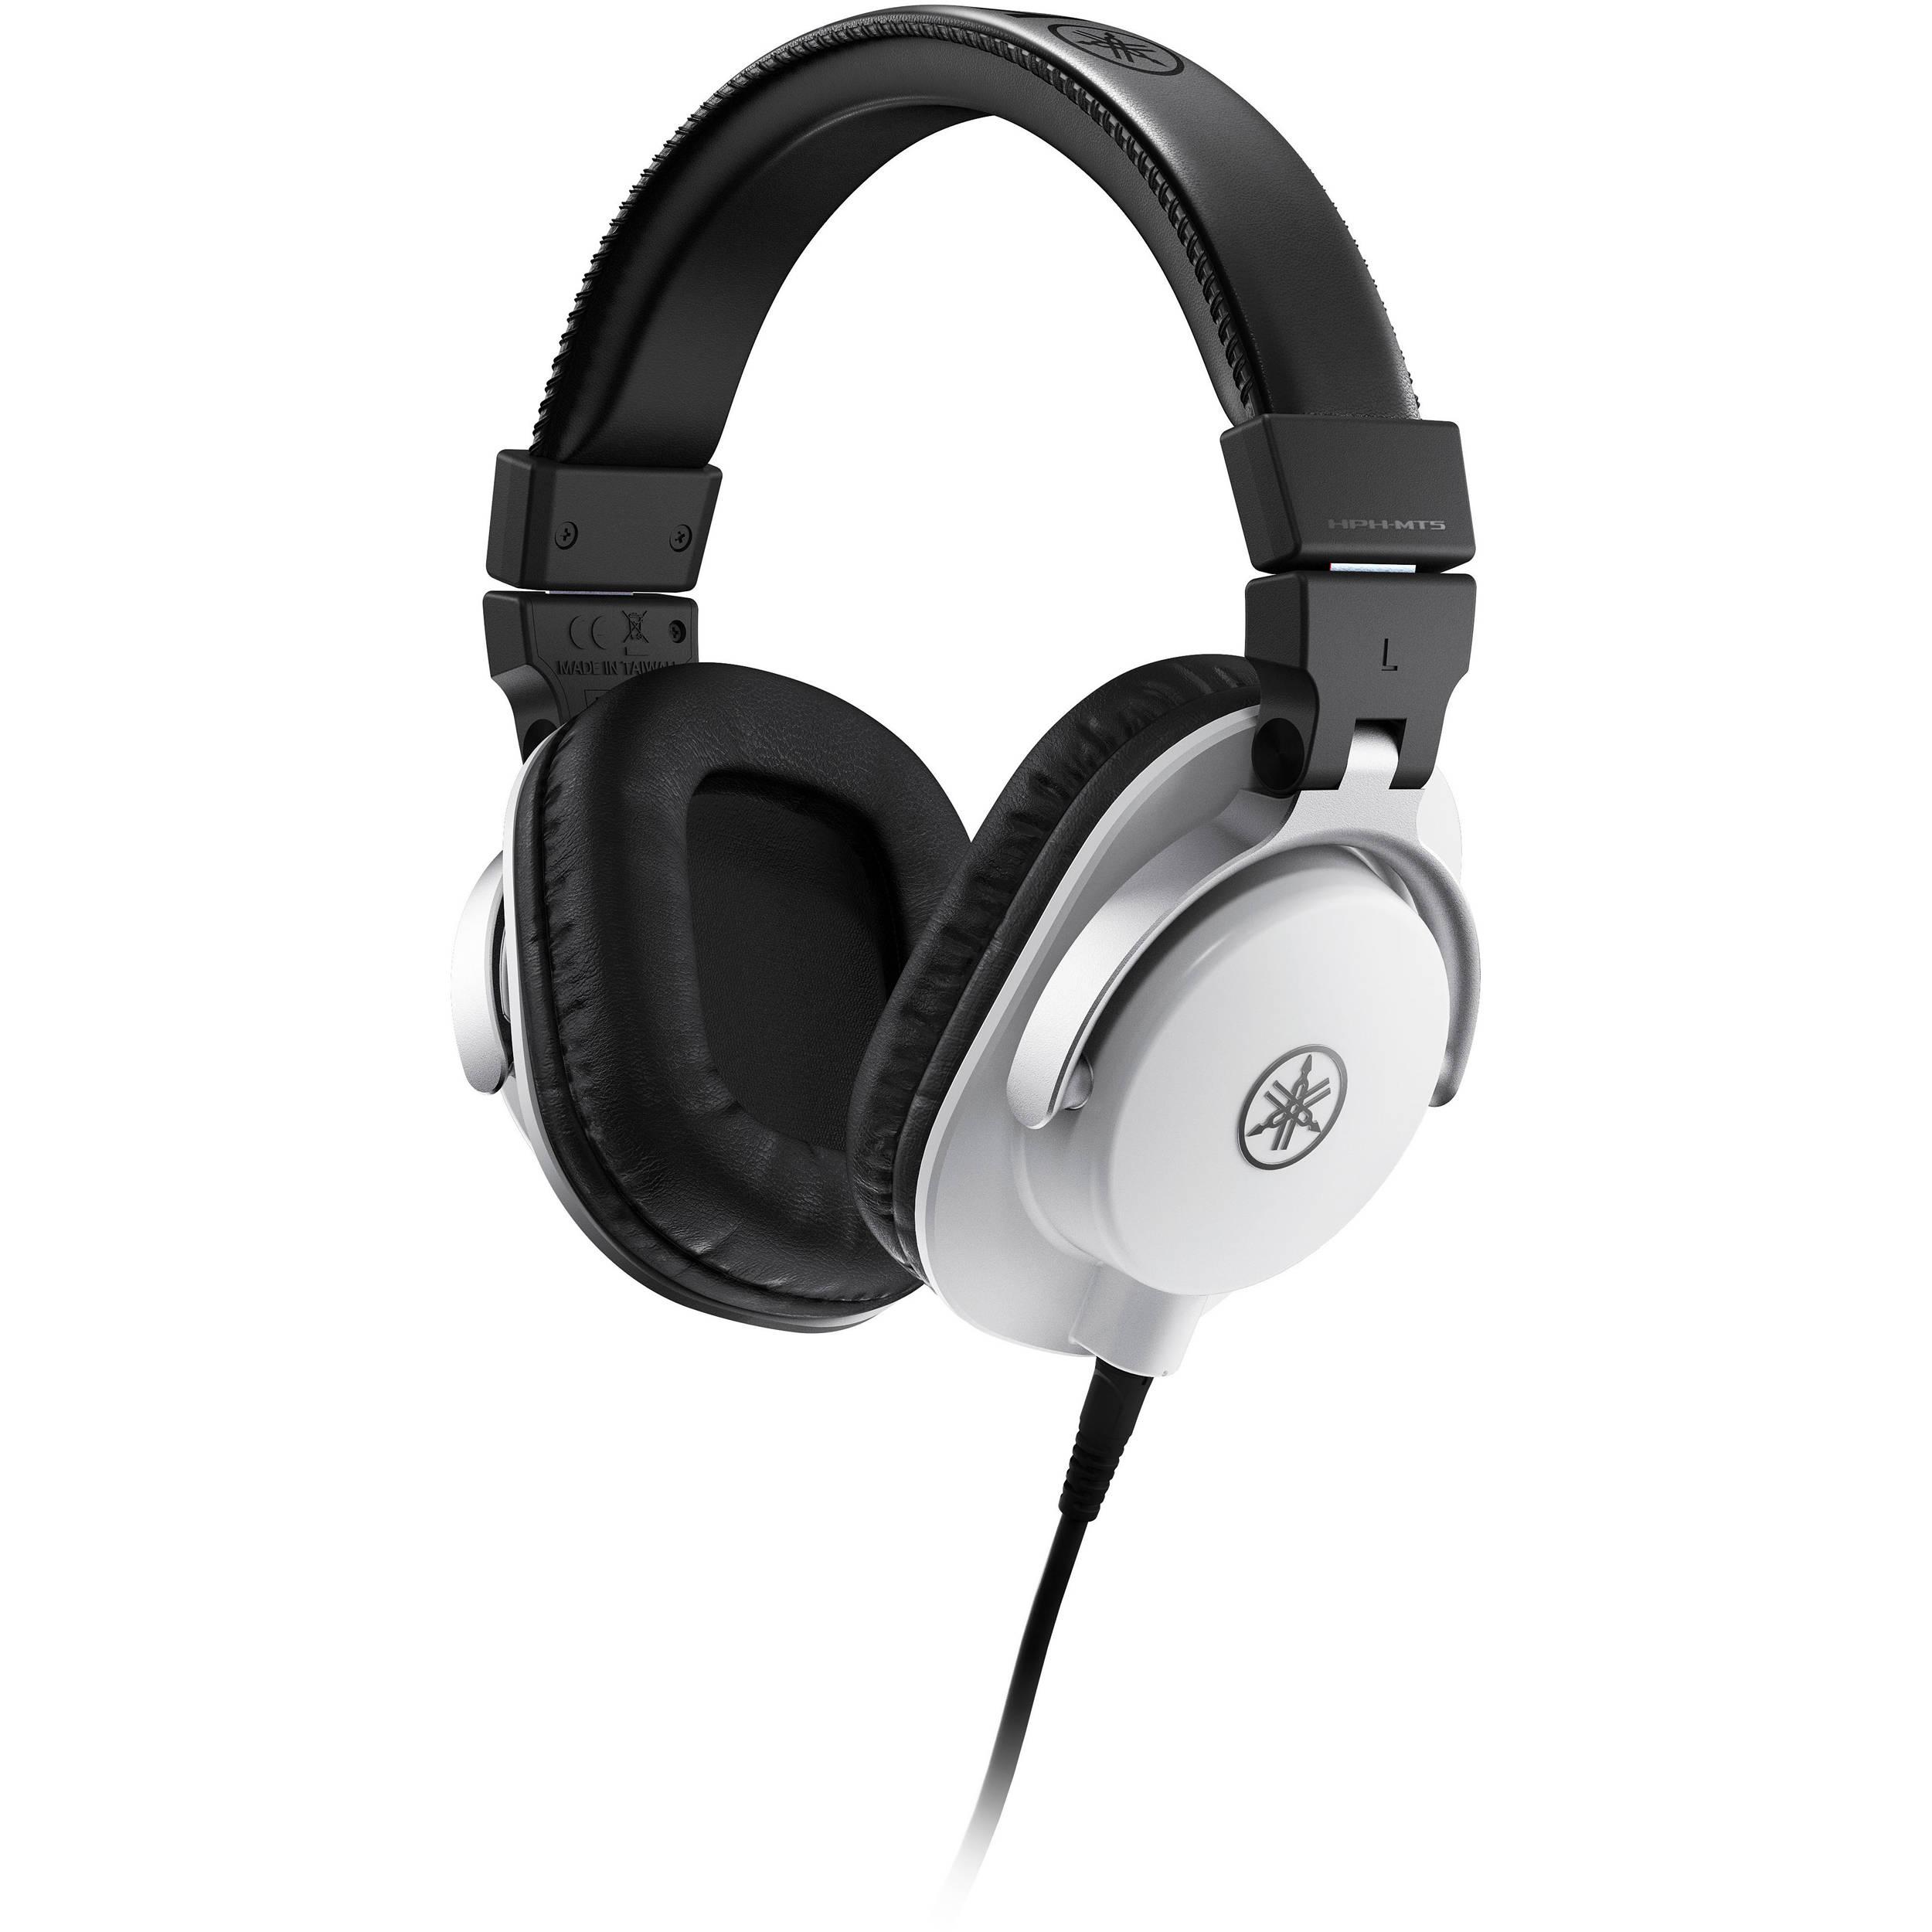 yamaha hph mt5w studio monitor headphones white hph mt5w b h. Black Bedroom Furniture Sets. Home Design Ideas